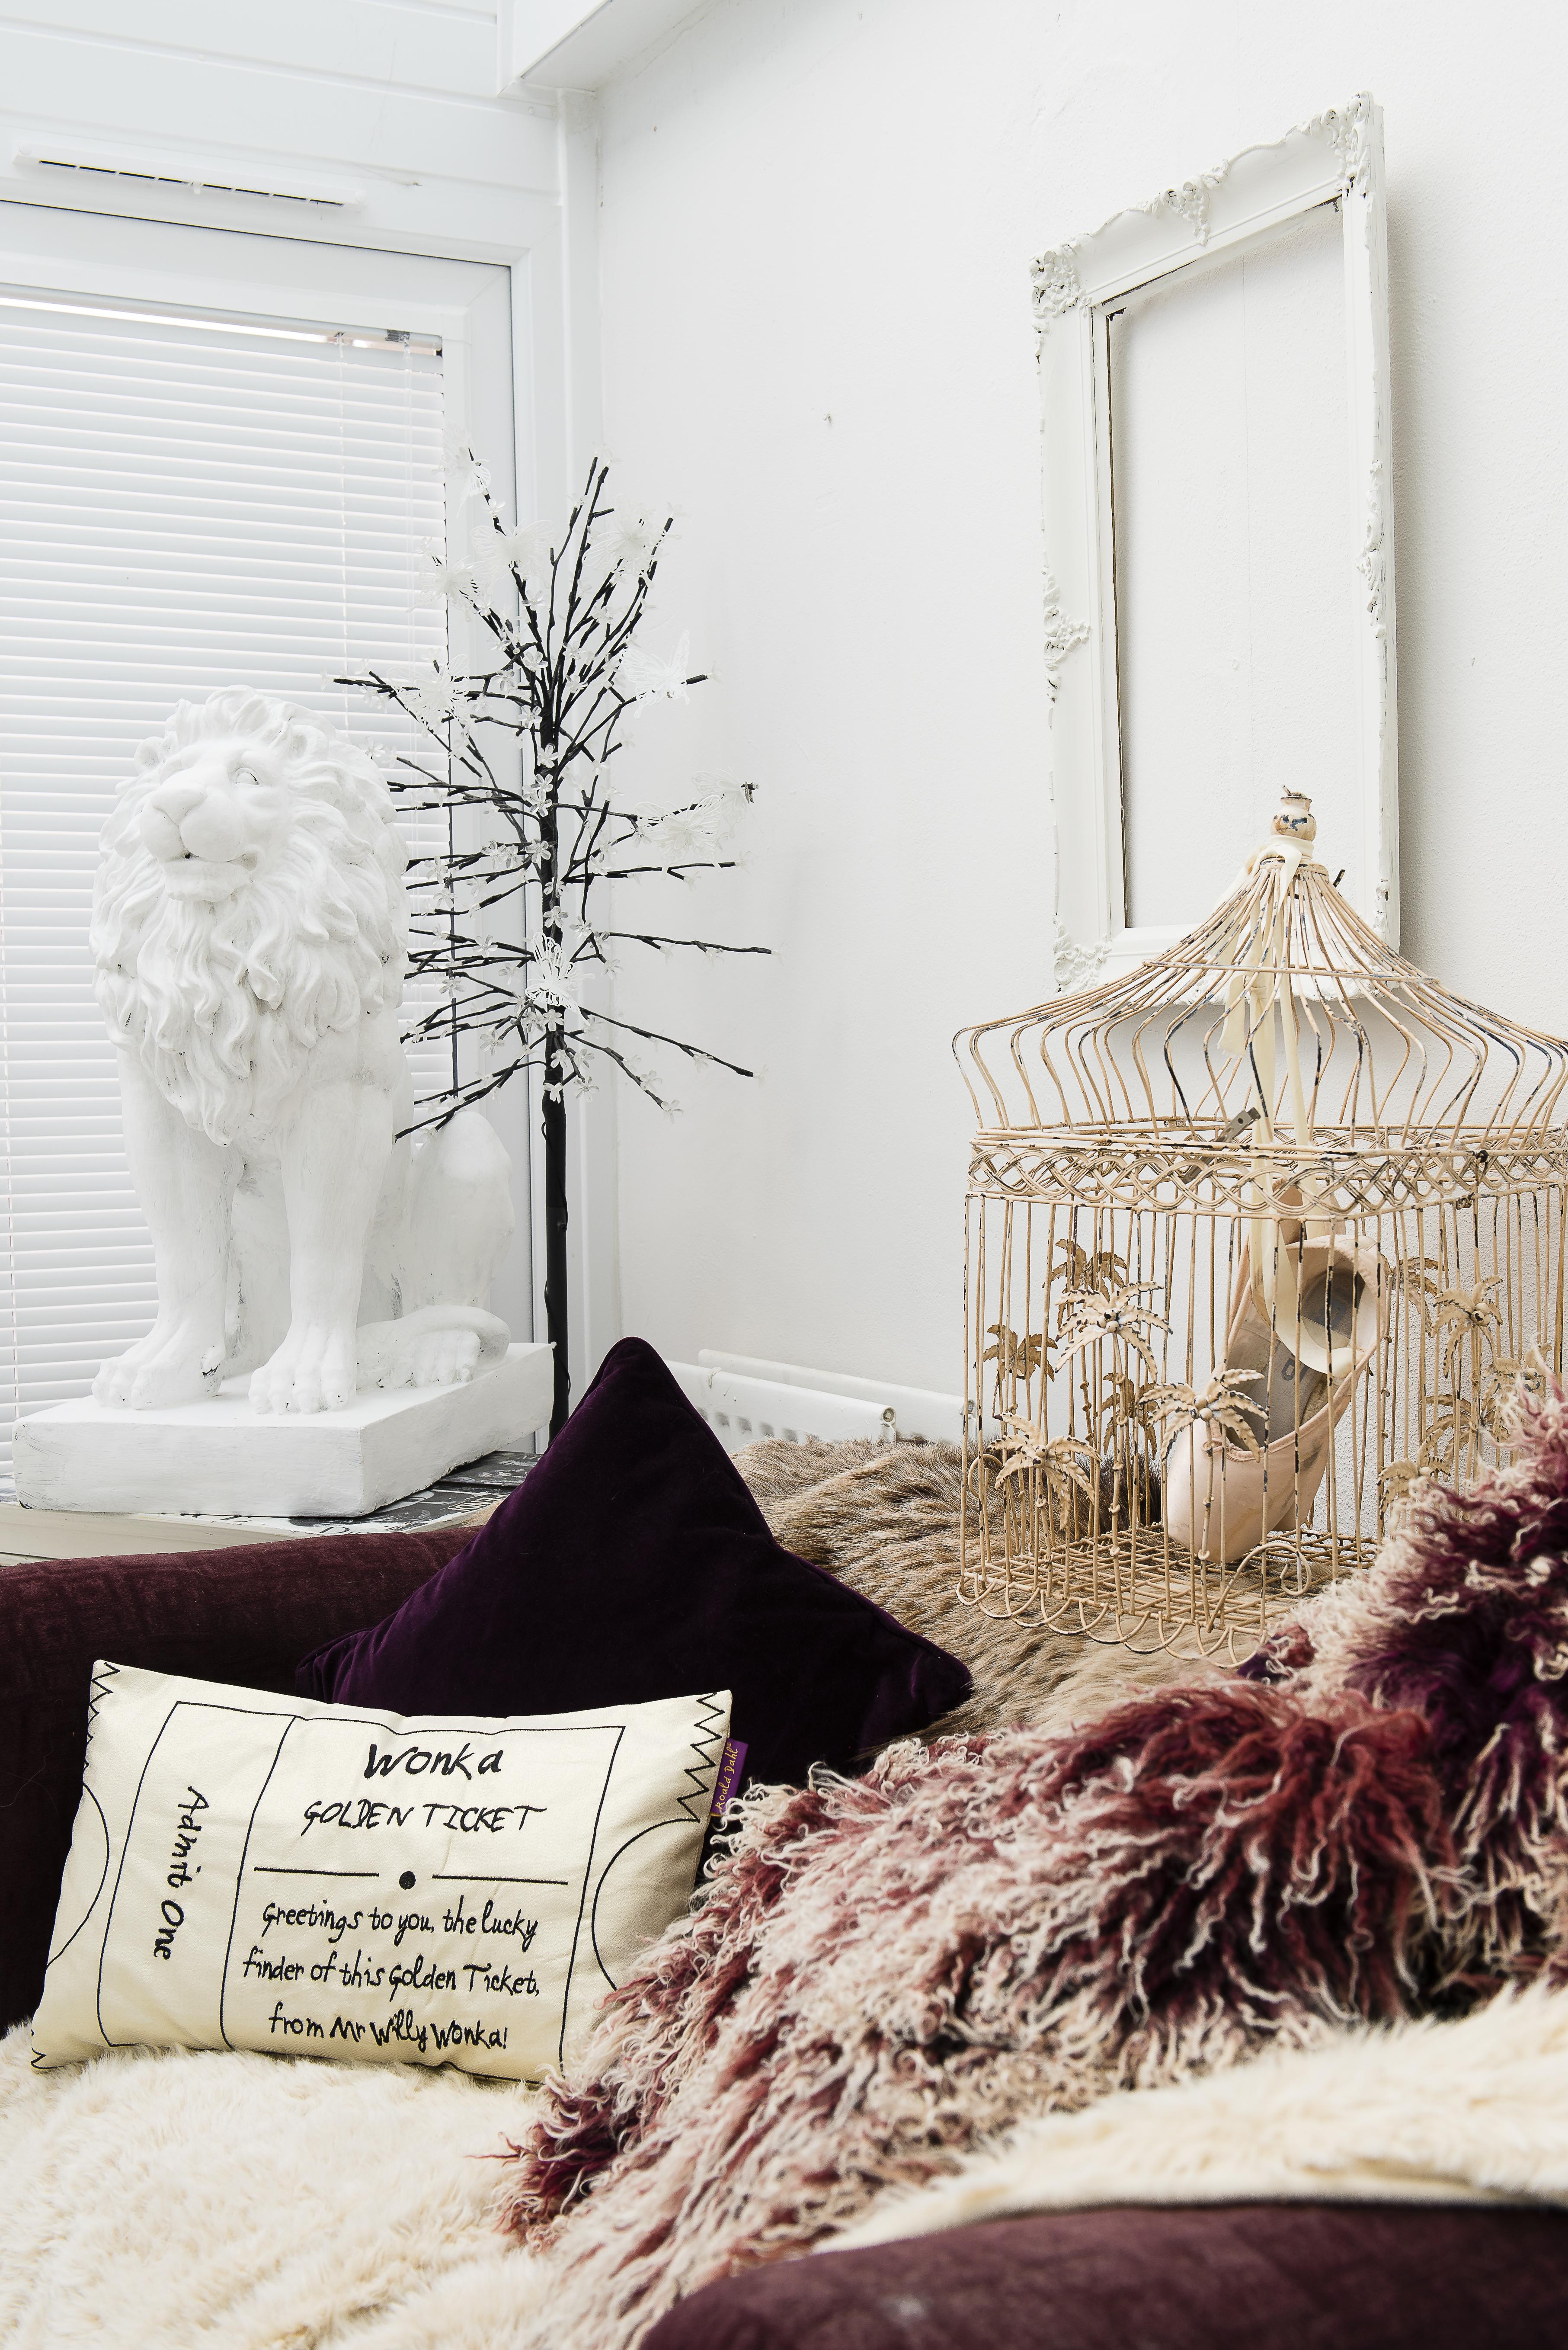 Hollywood Glamour – Priceless Magazines